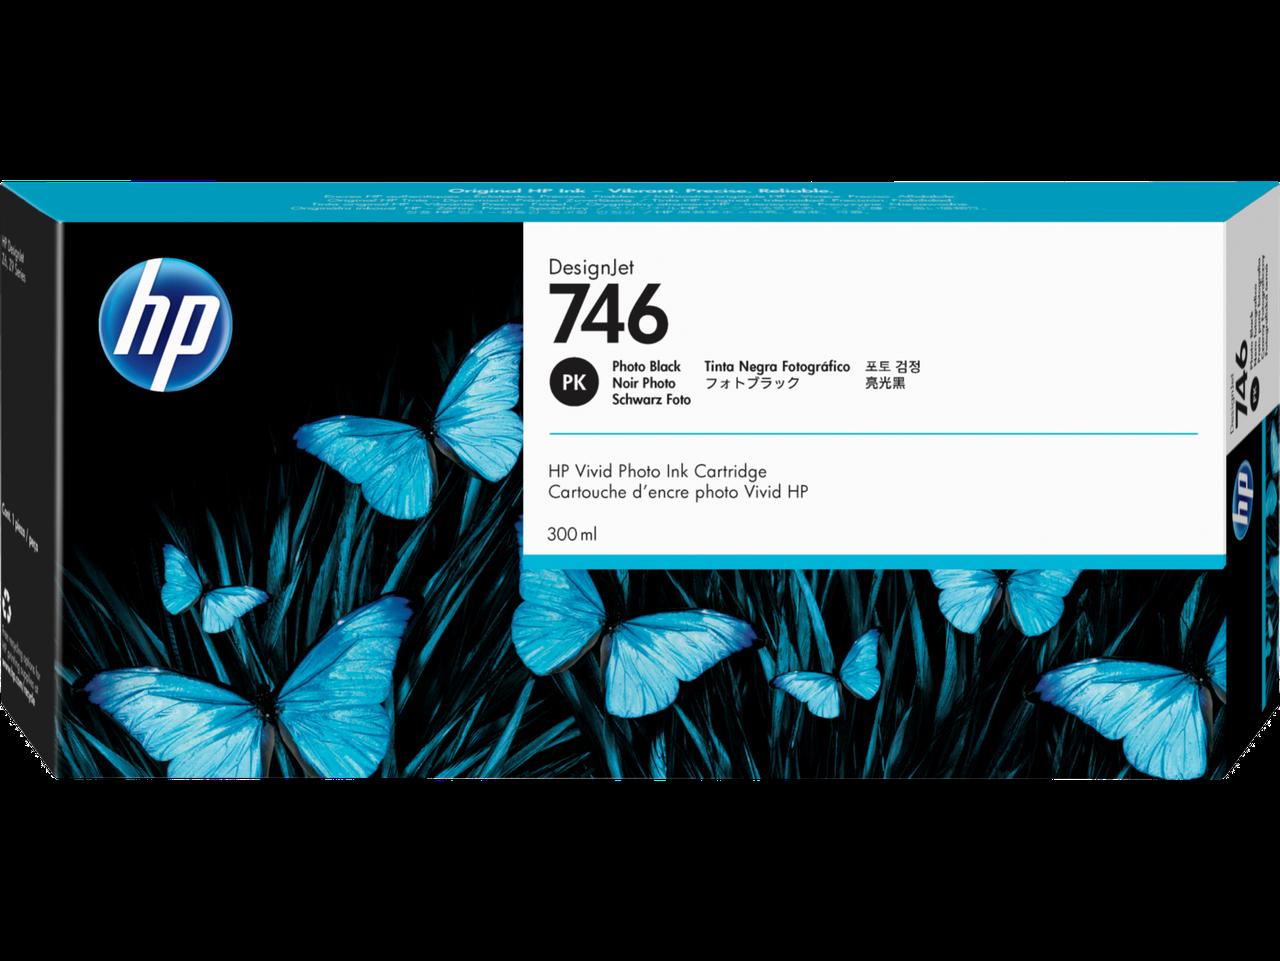 HP P2V82A Картридж фото черный HP 746 для DesignJet Z6/Z9+, 300 мл